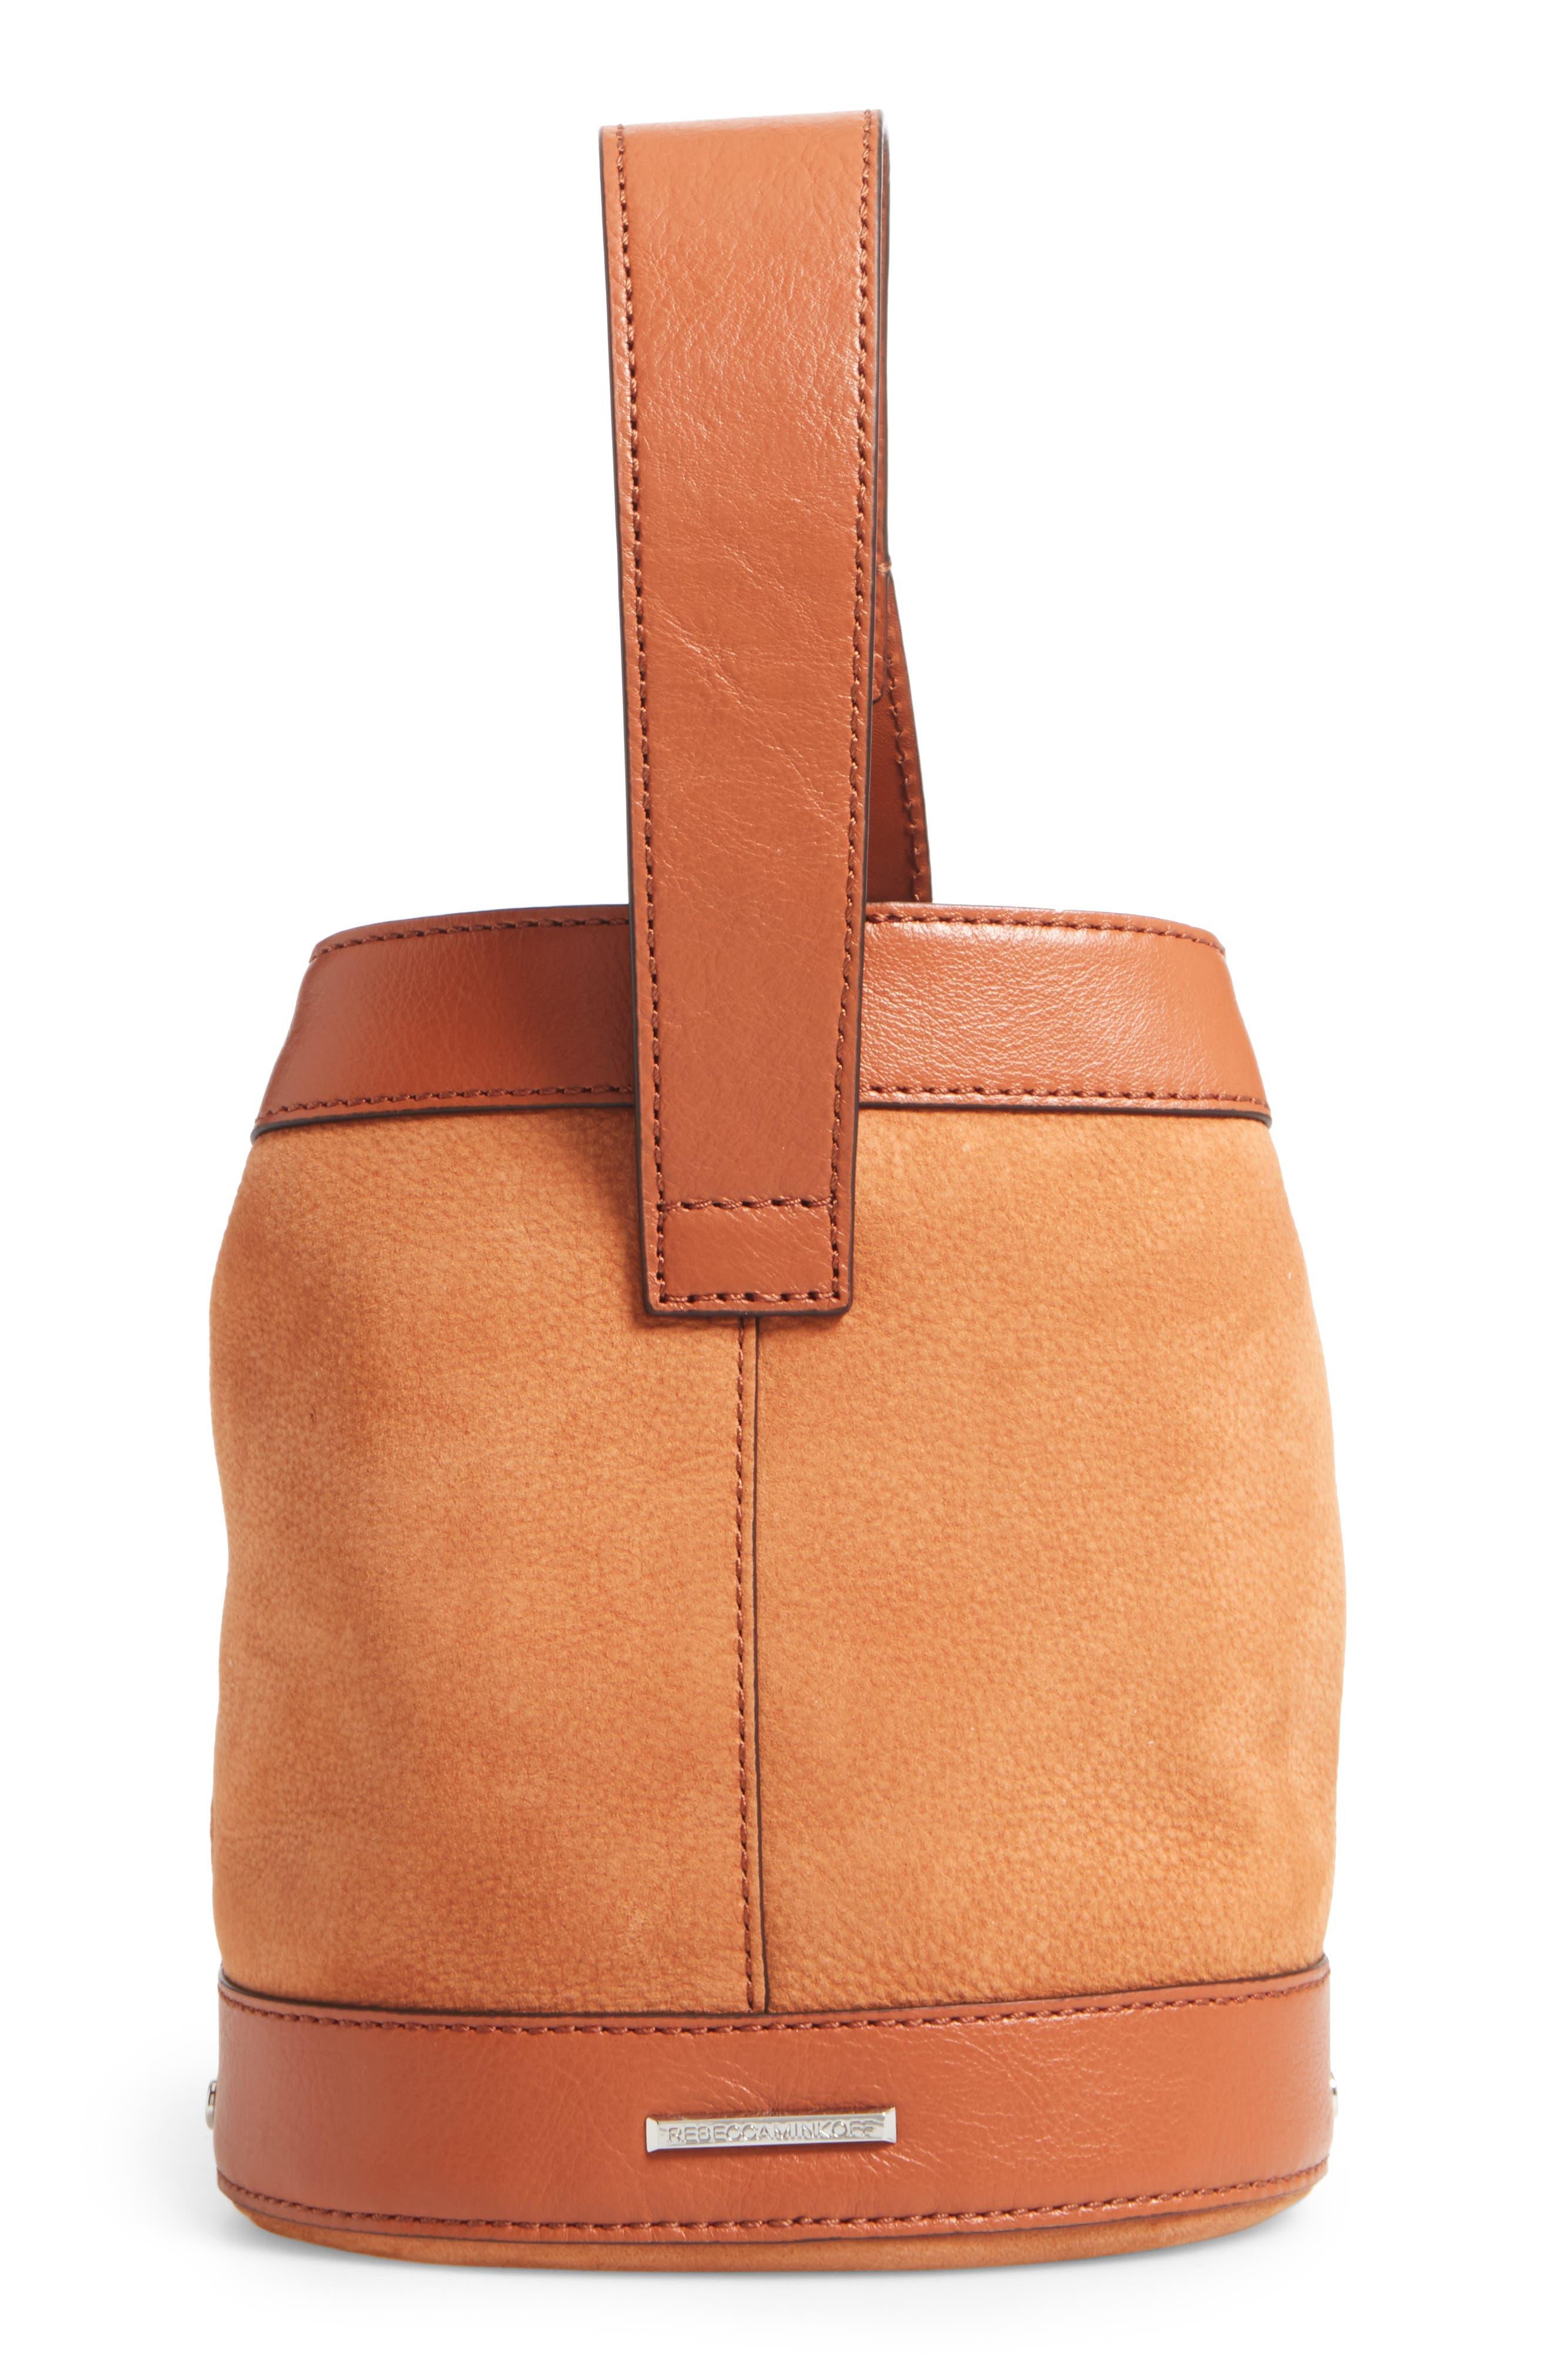 Mini Mission Leather Bucket Bag,                             Alternate thumbnail 3, color,                             200